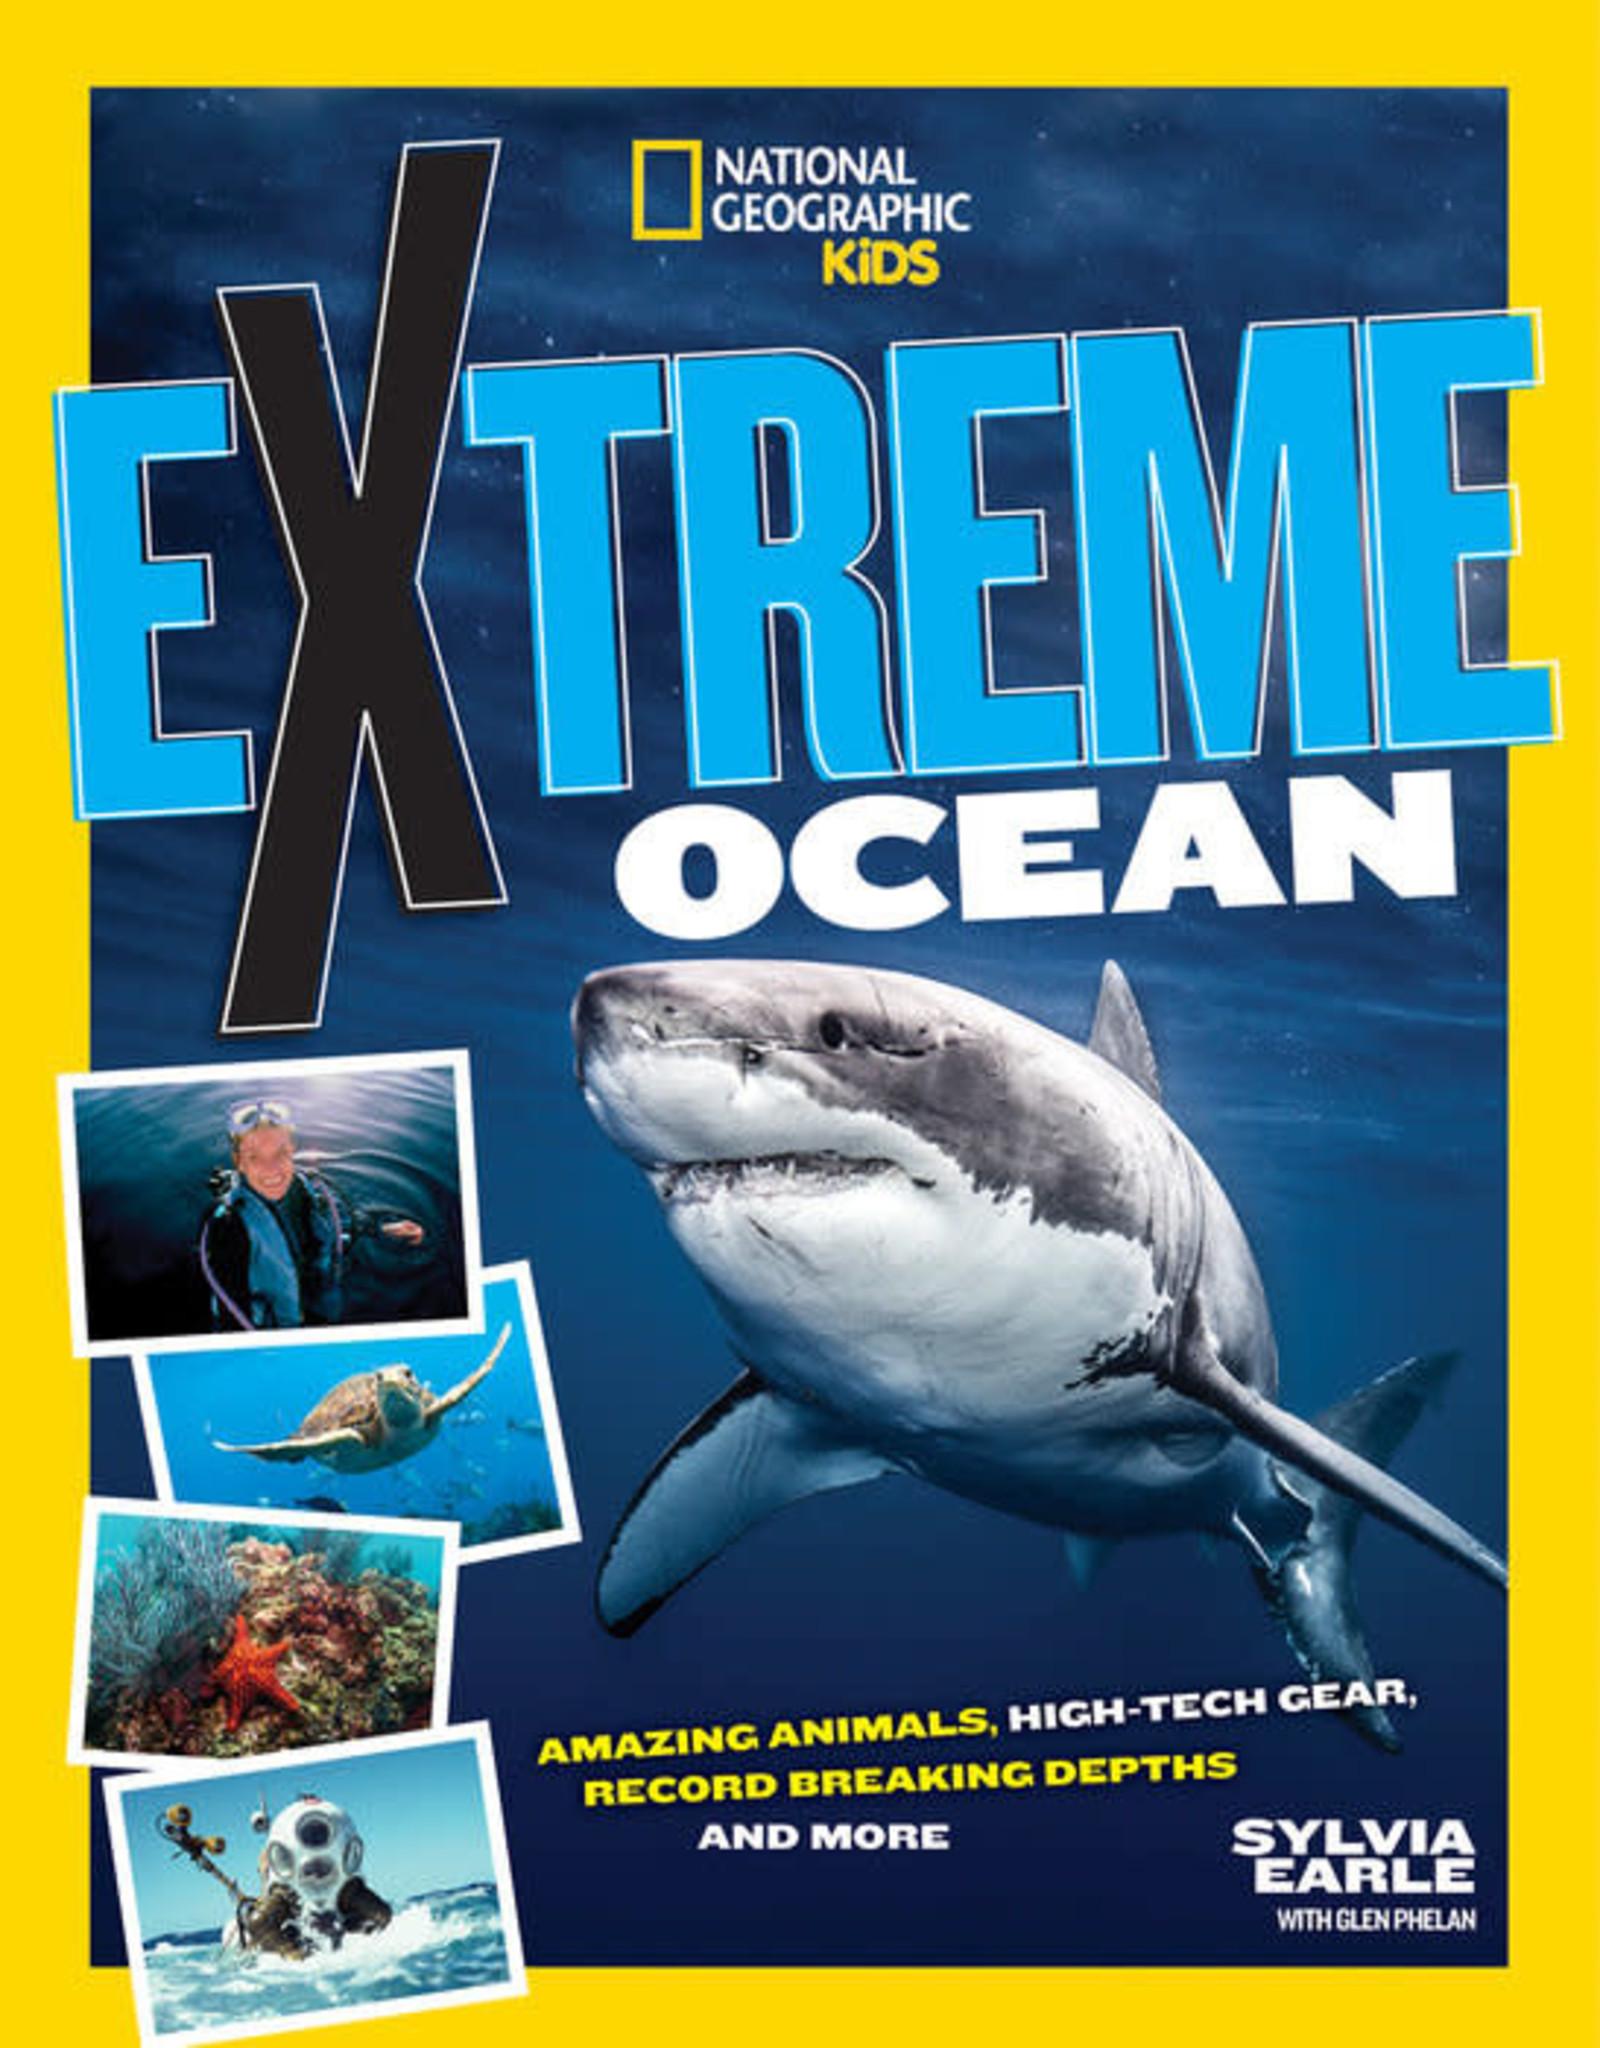 National Geographic Kids (NGK) NGK Extreme Ocean